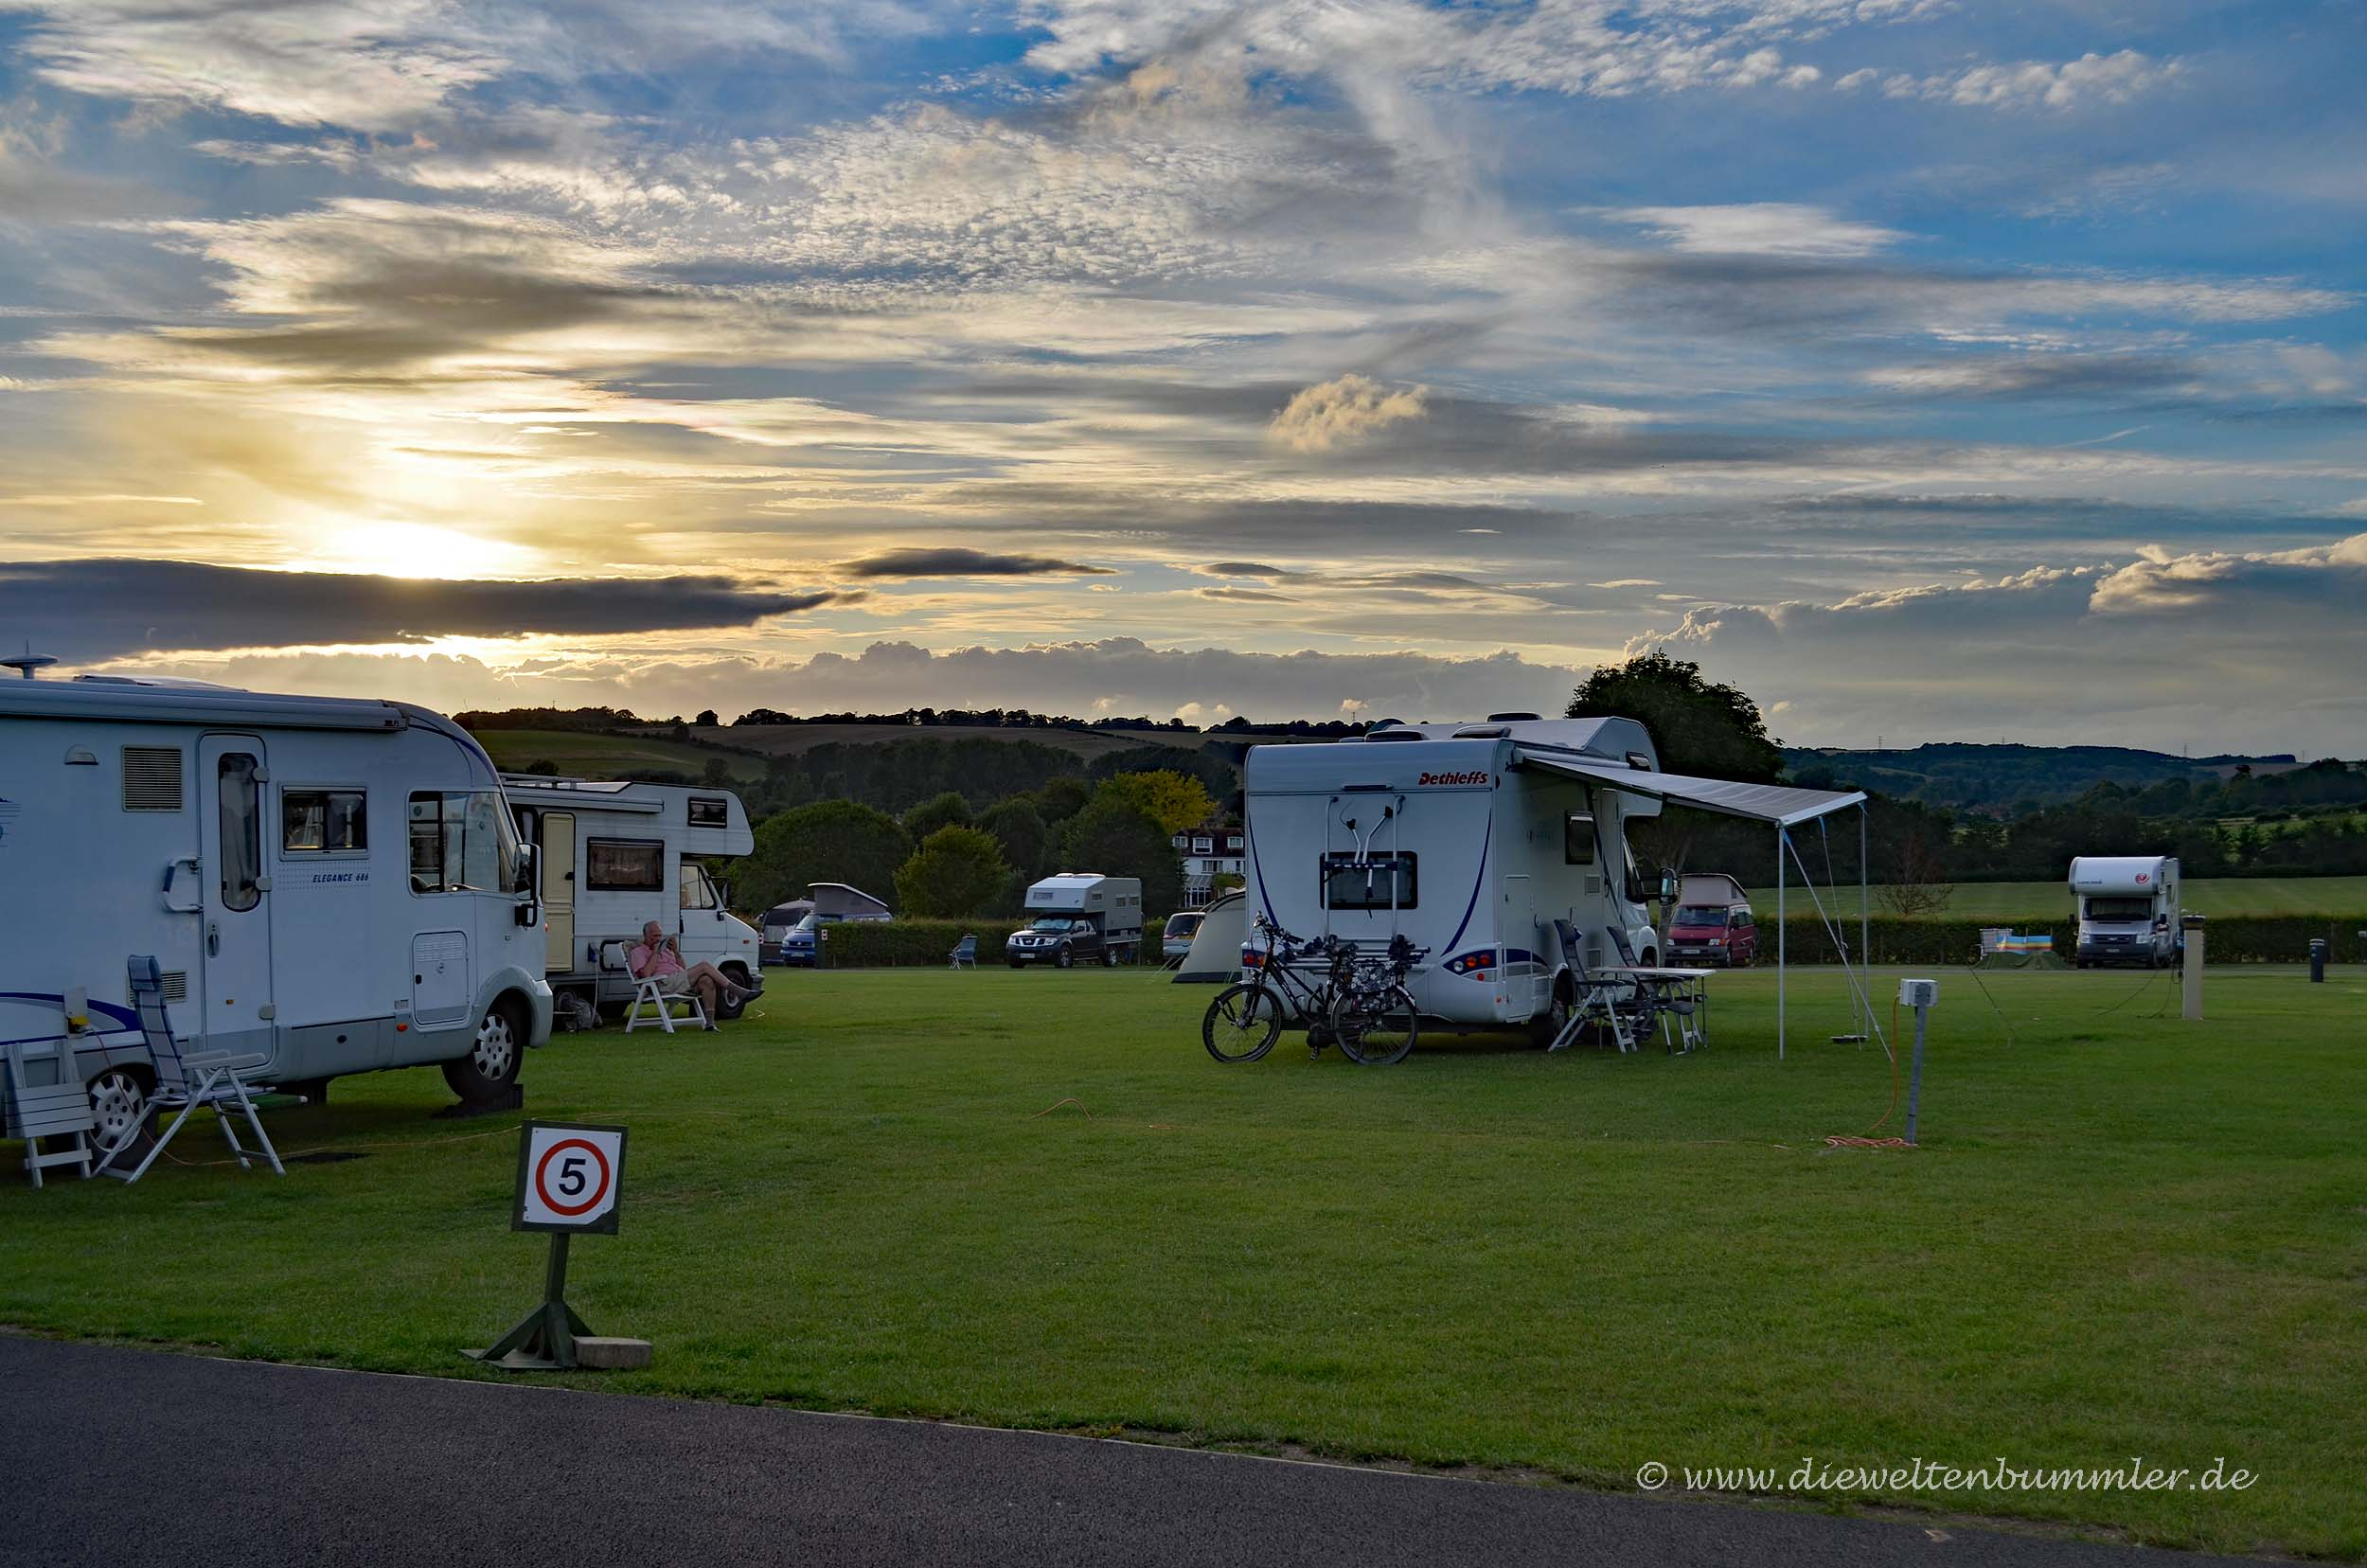 Campingplatz in England